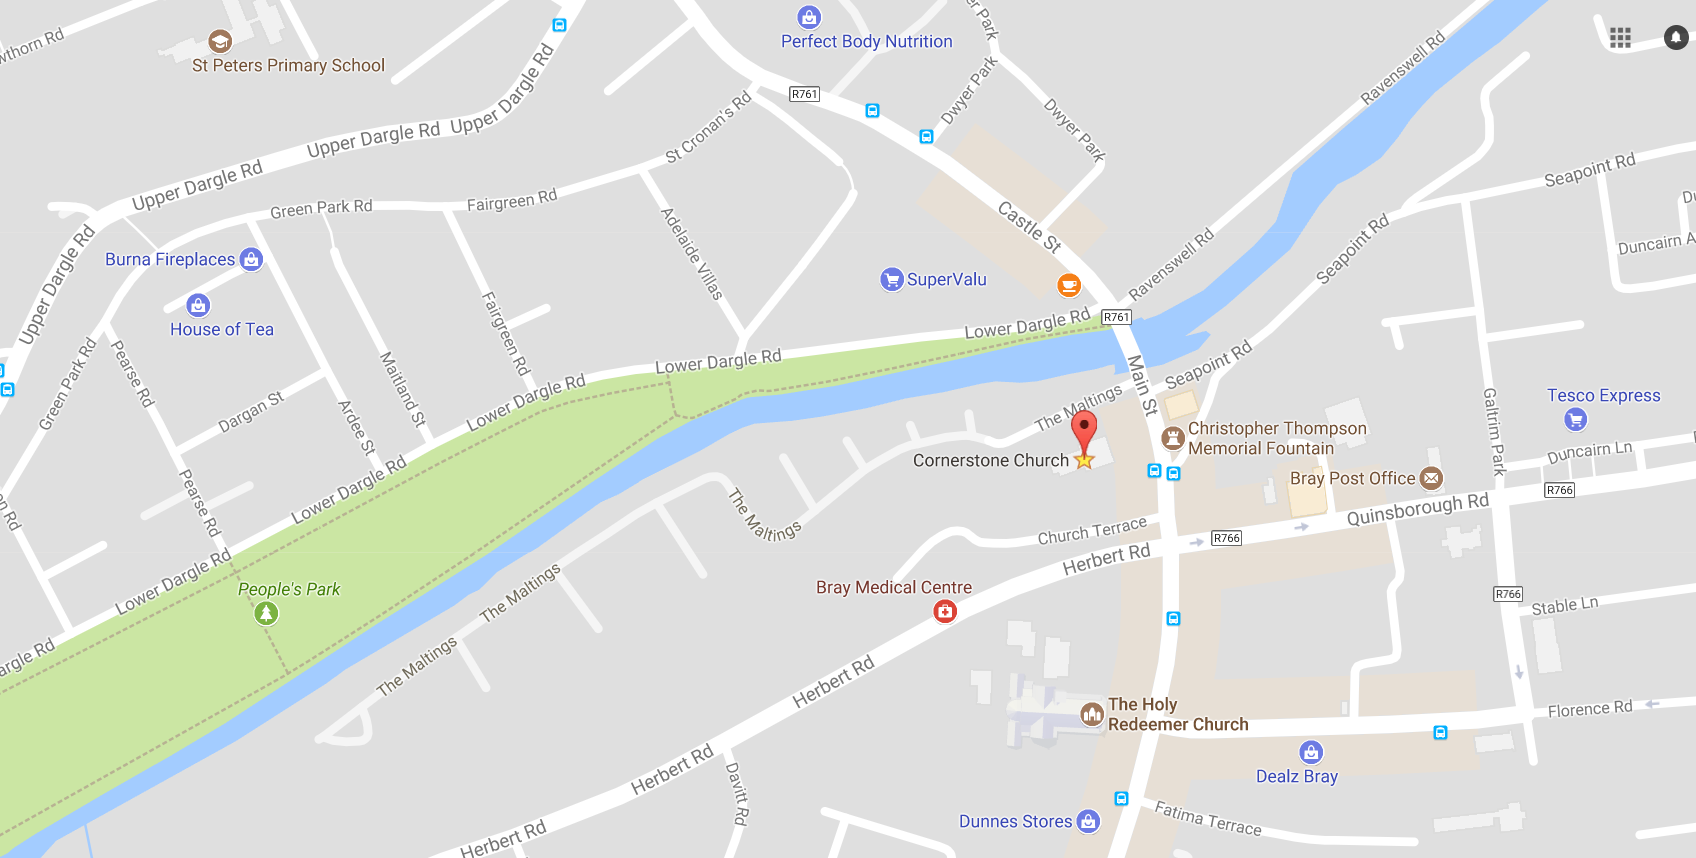 Click For Directions:   https://goo.gl/maps/aZUYxJwNkfL2